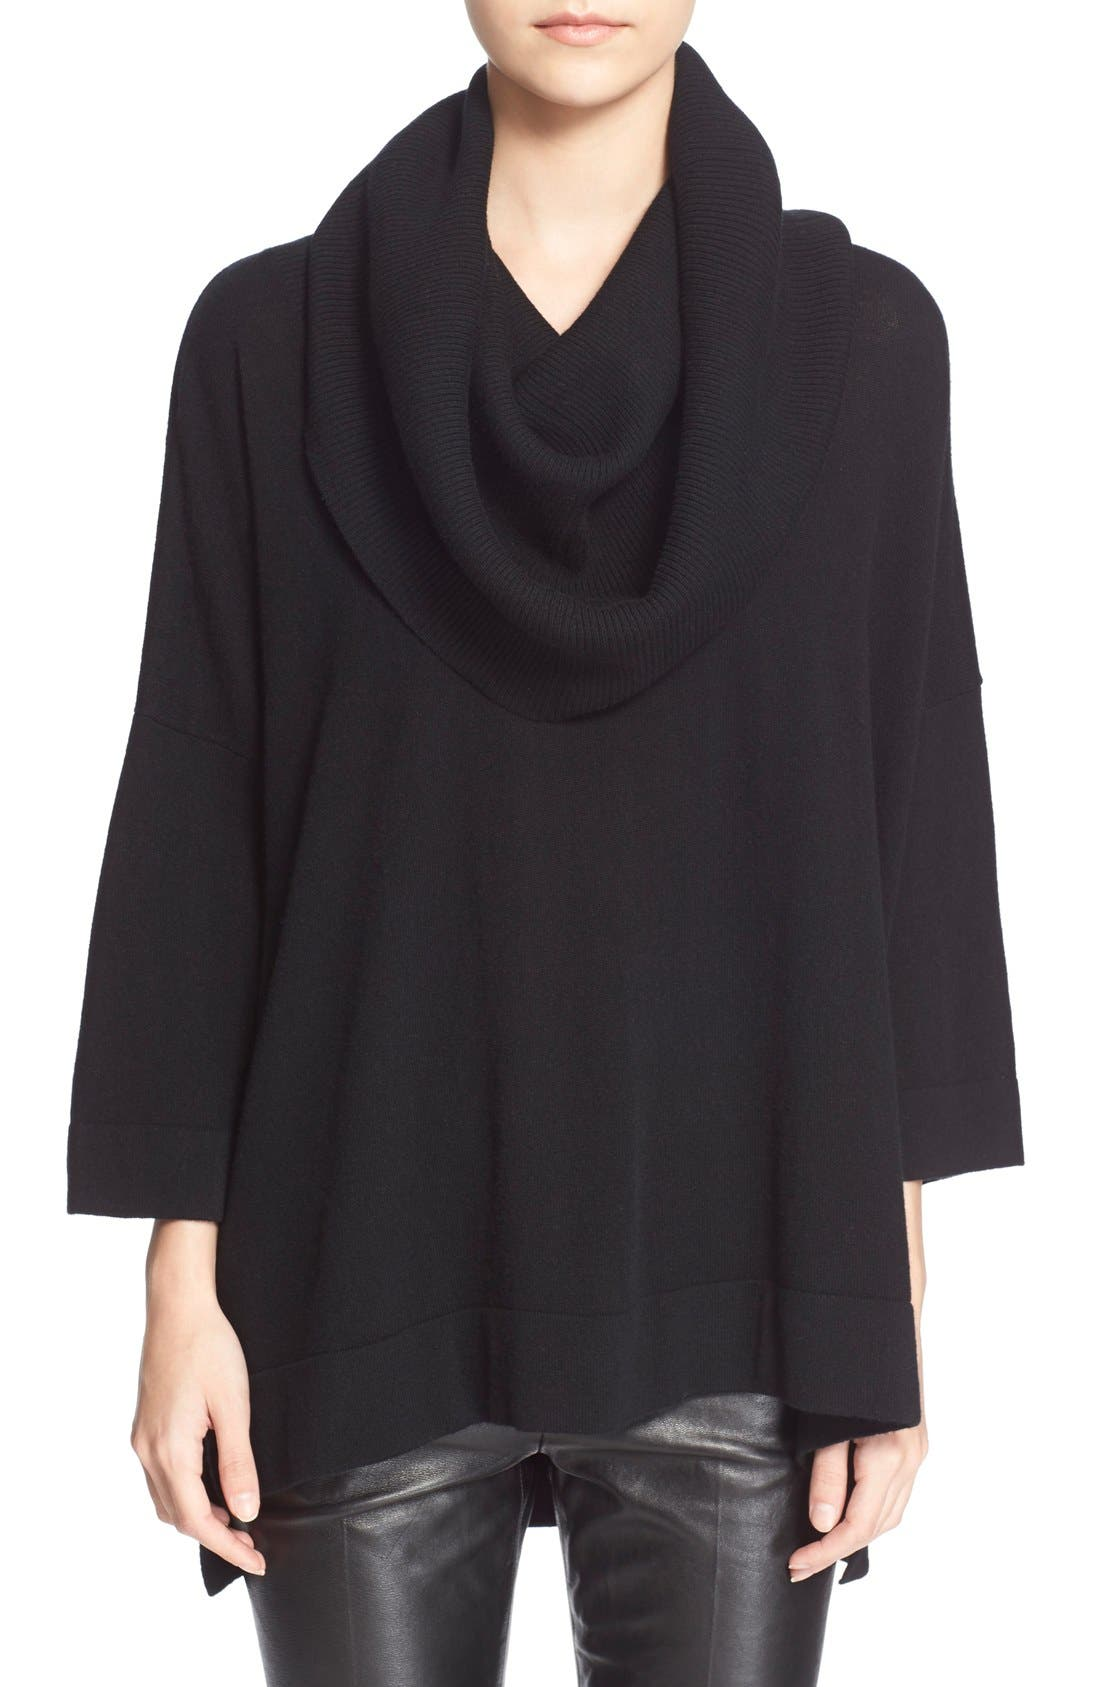 Alternate Image 1 Selected - autumn cashmere Oversized ConvertibleCowl NeckSweater